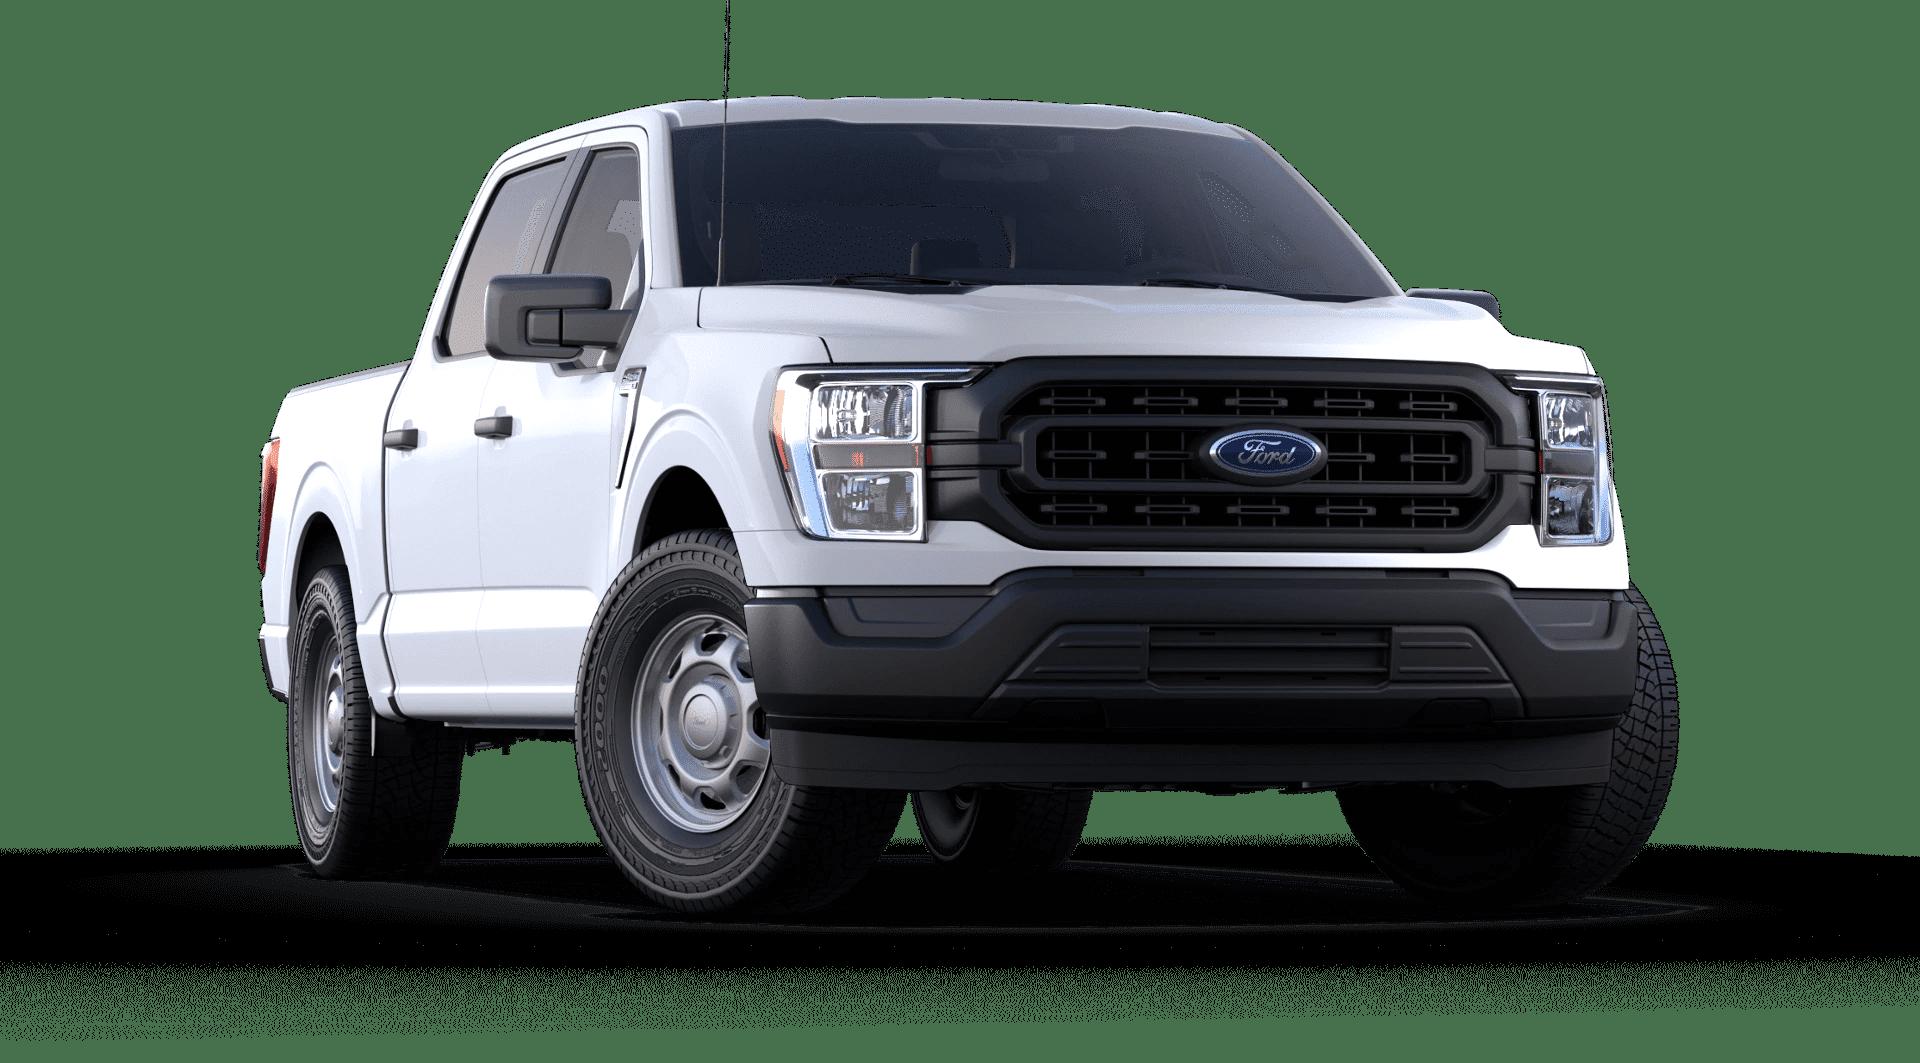 https://www.cityrentatruck.com/wp-content/uploads/2021/03/Pickup-Ford-Stock-Front.png